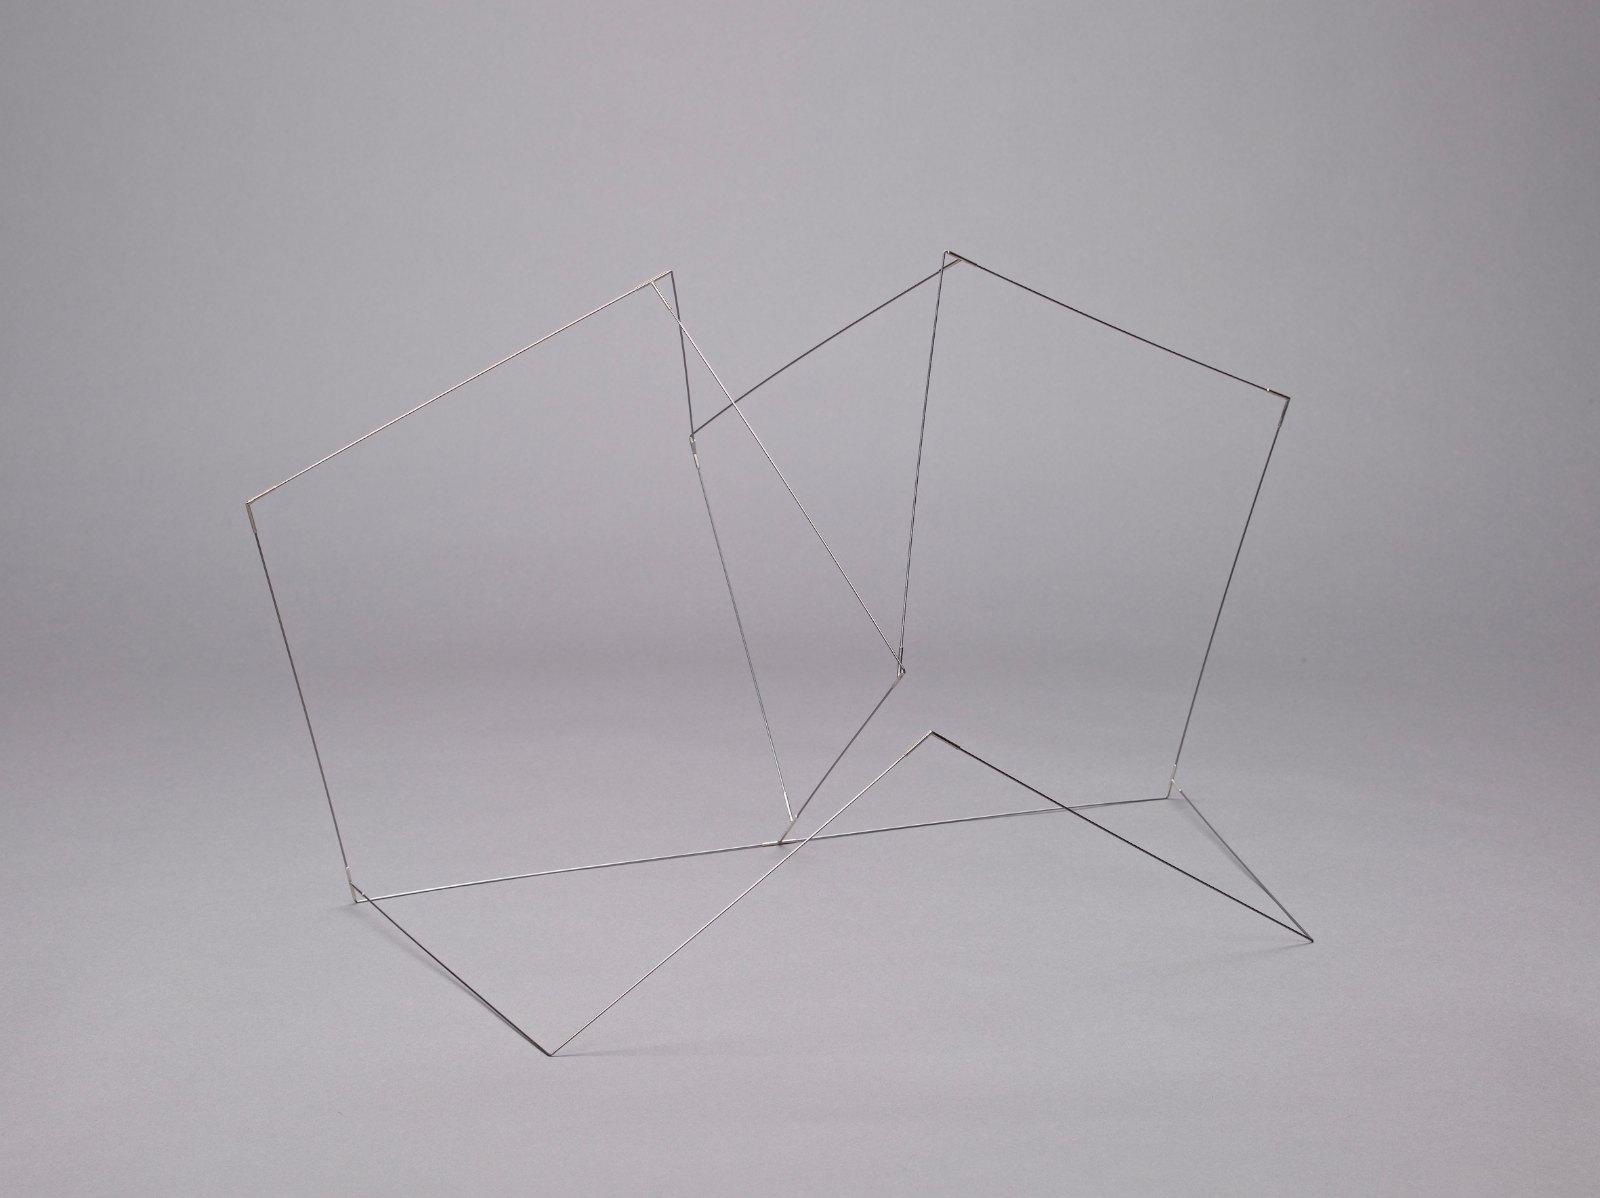 Sculpture VI, 2006, steel, silver, 35.5 x 62 x 37 cm